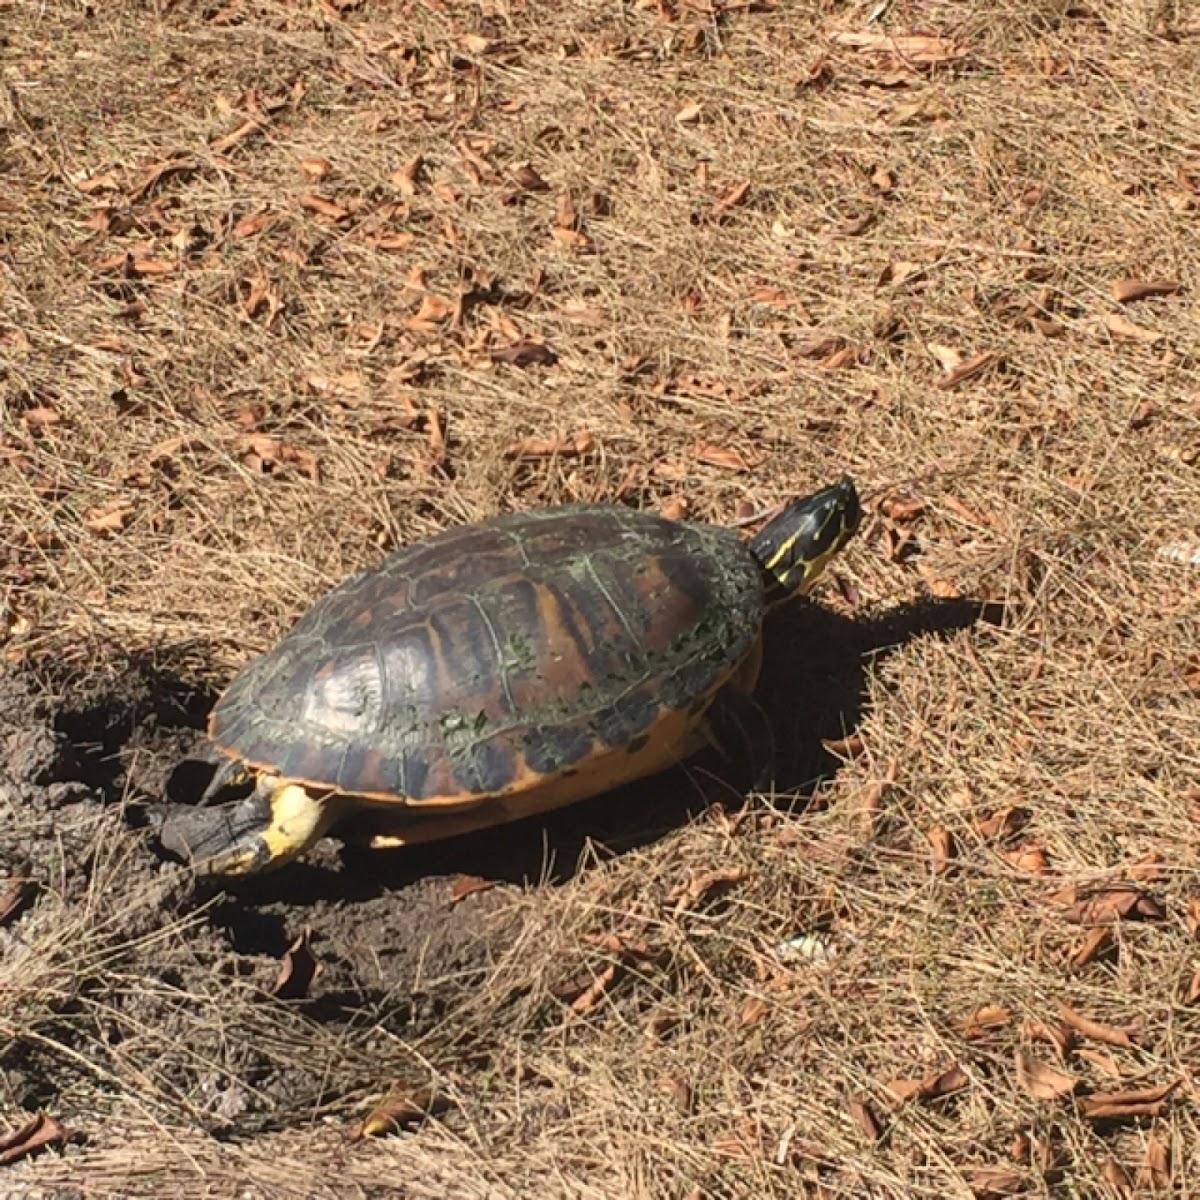 Florida Red-bellied Turtles